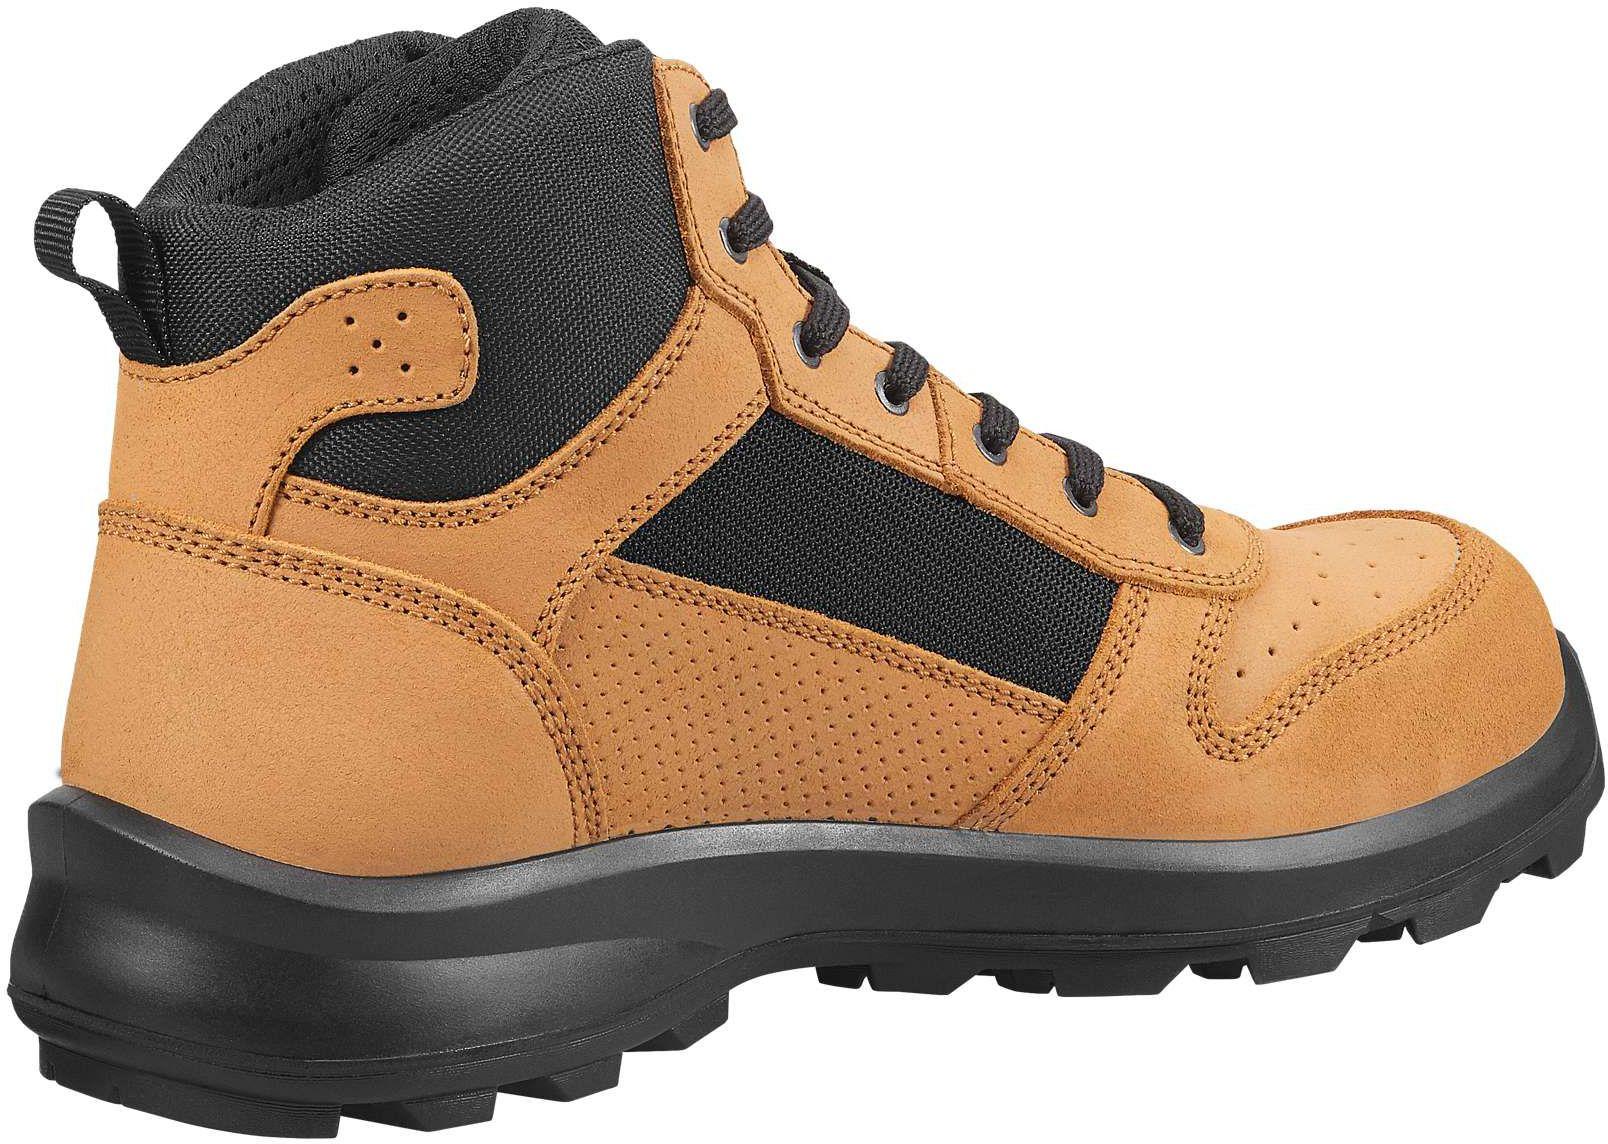 Carhartt Herren Sicherheitsschuhe Michigan Sneaker Mid Carhartt® Brown